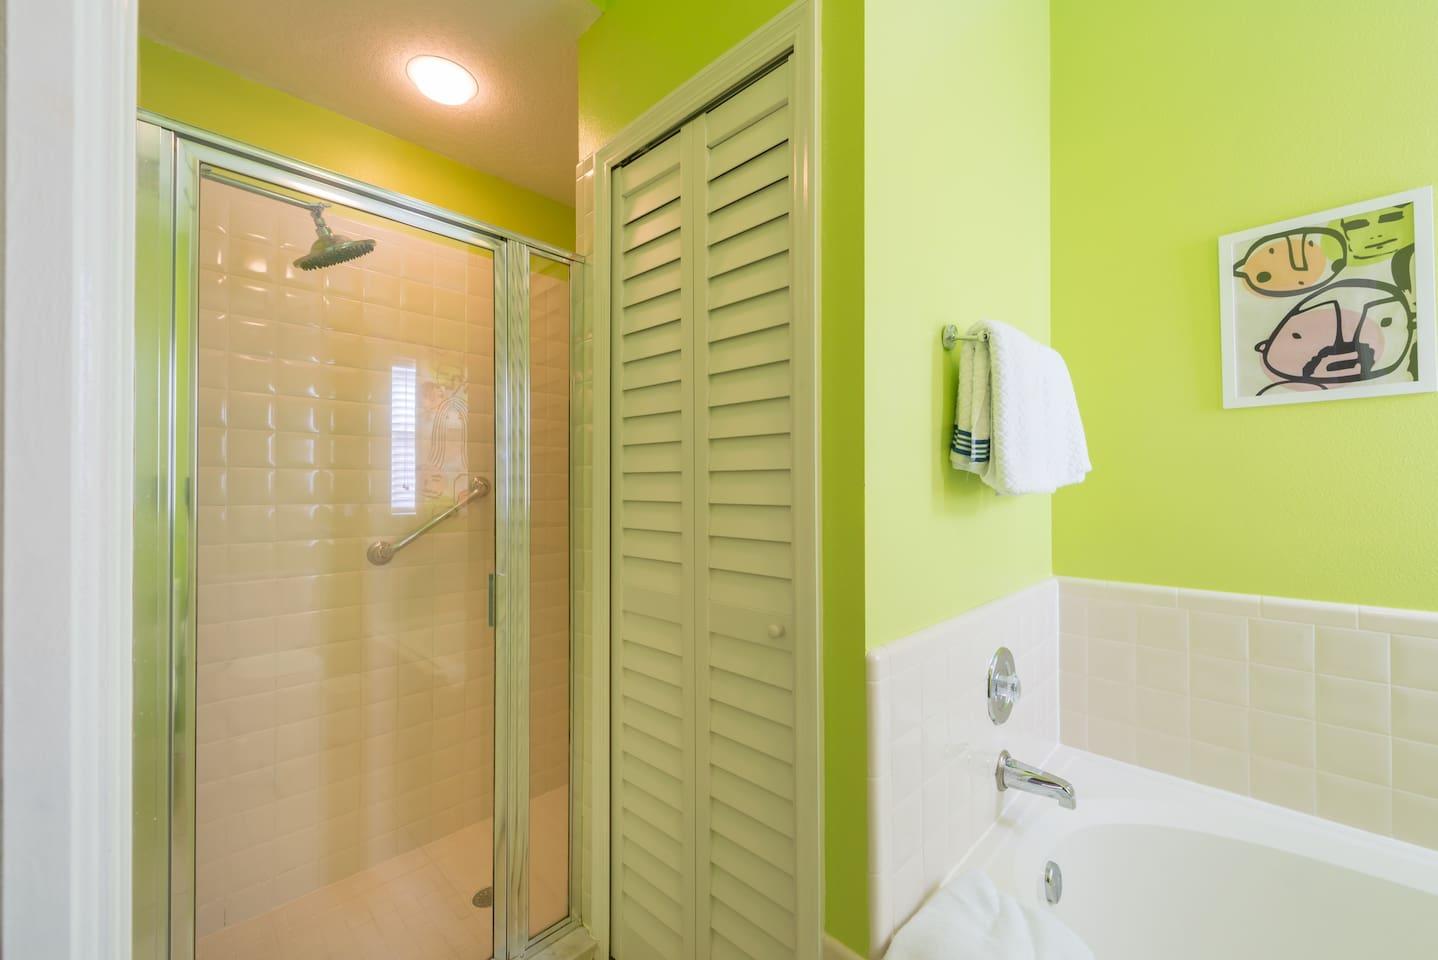 Apartment Spacious 3BR Home   King Bed  Near Disney w  Pool  photo 16905117